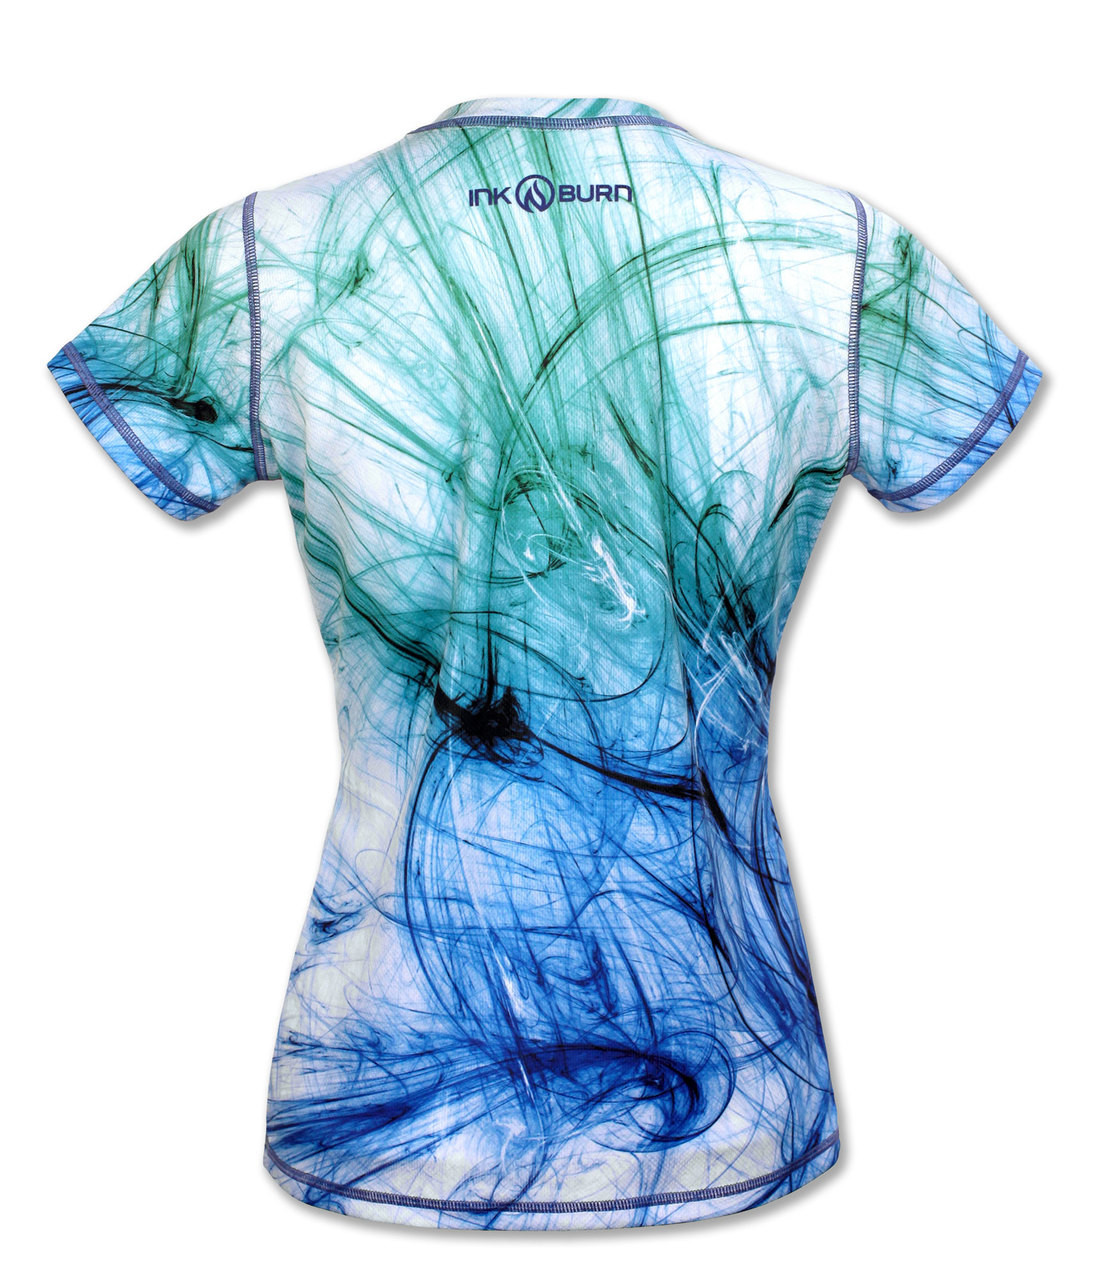 INKnBURN Women's Sketch Tech Shirt Front